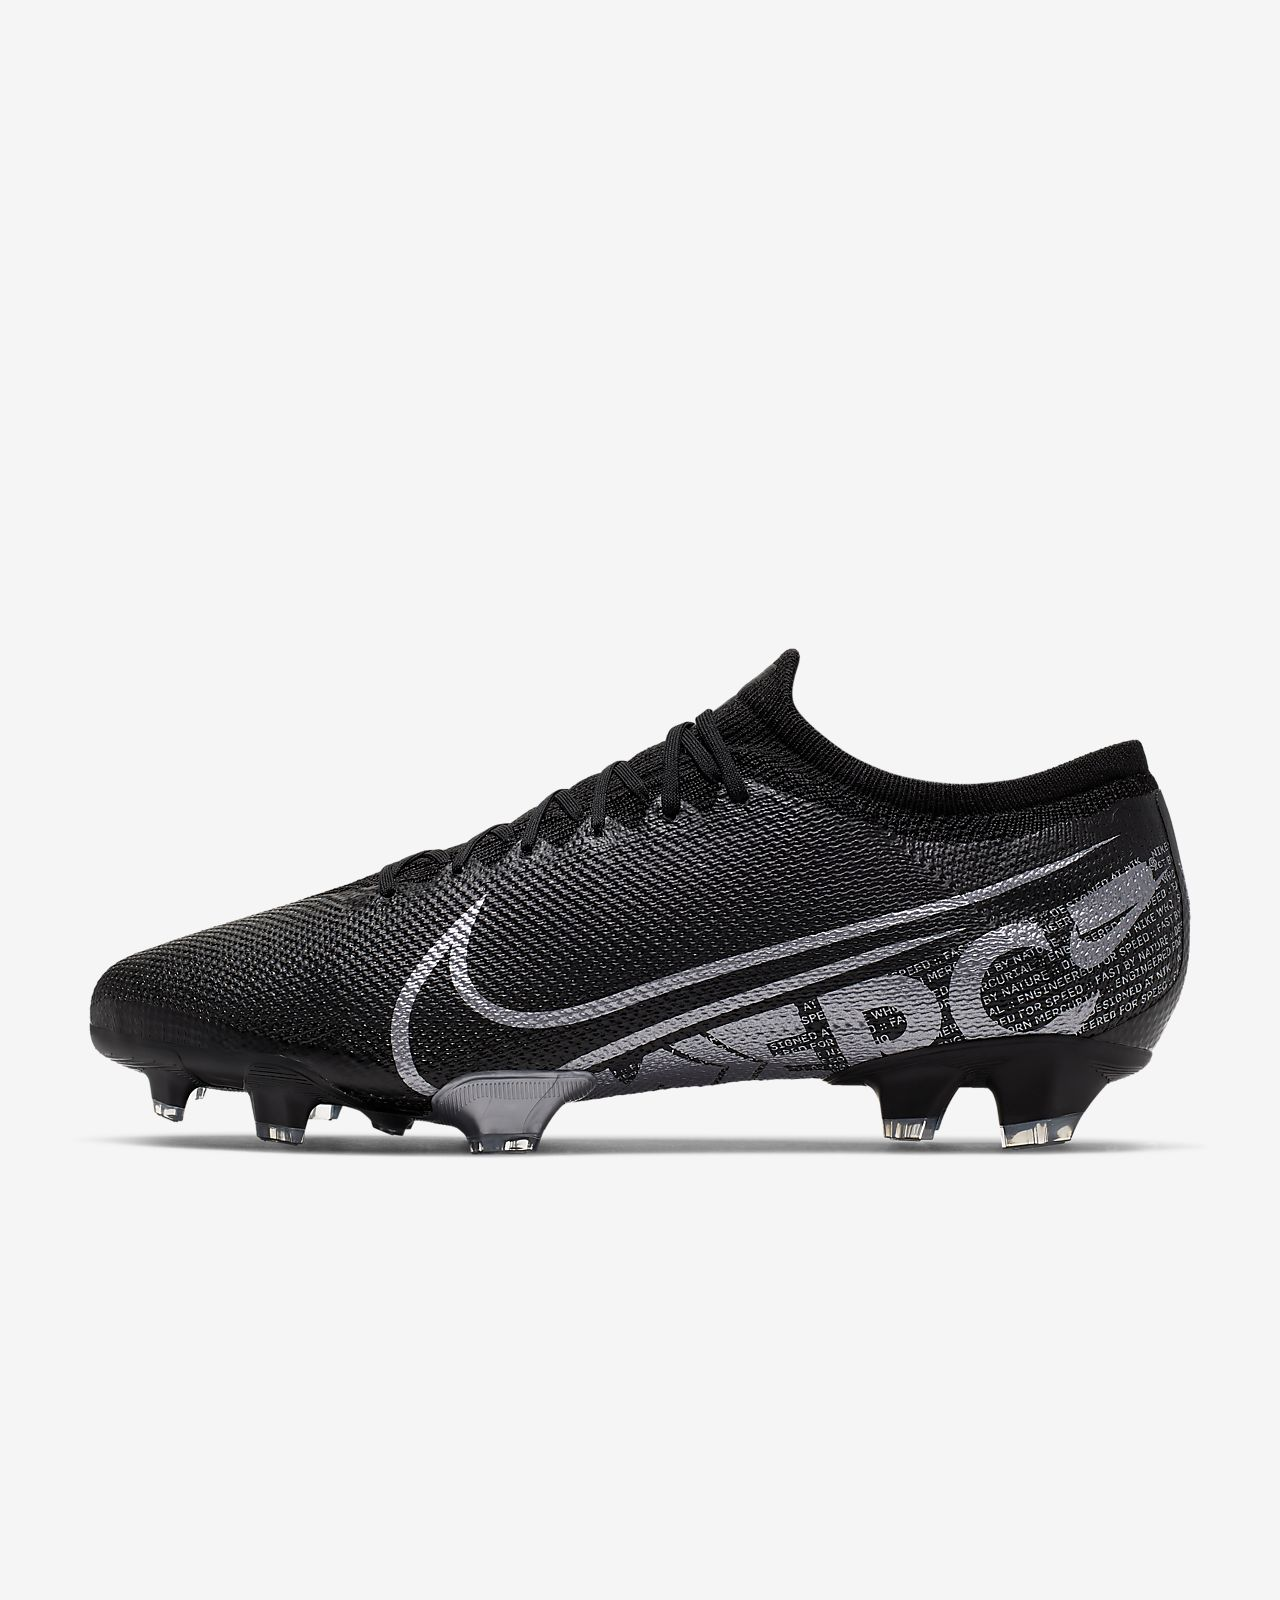 Nike Vapor NIKE | Sneaker günstig kaufen